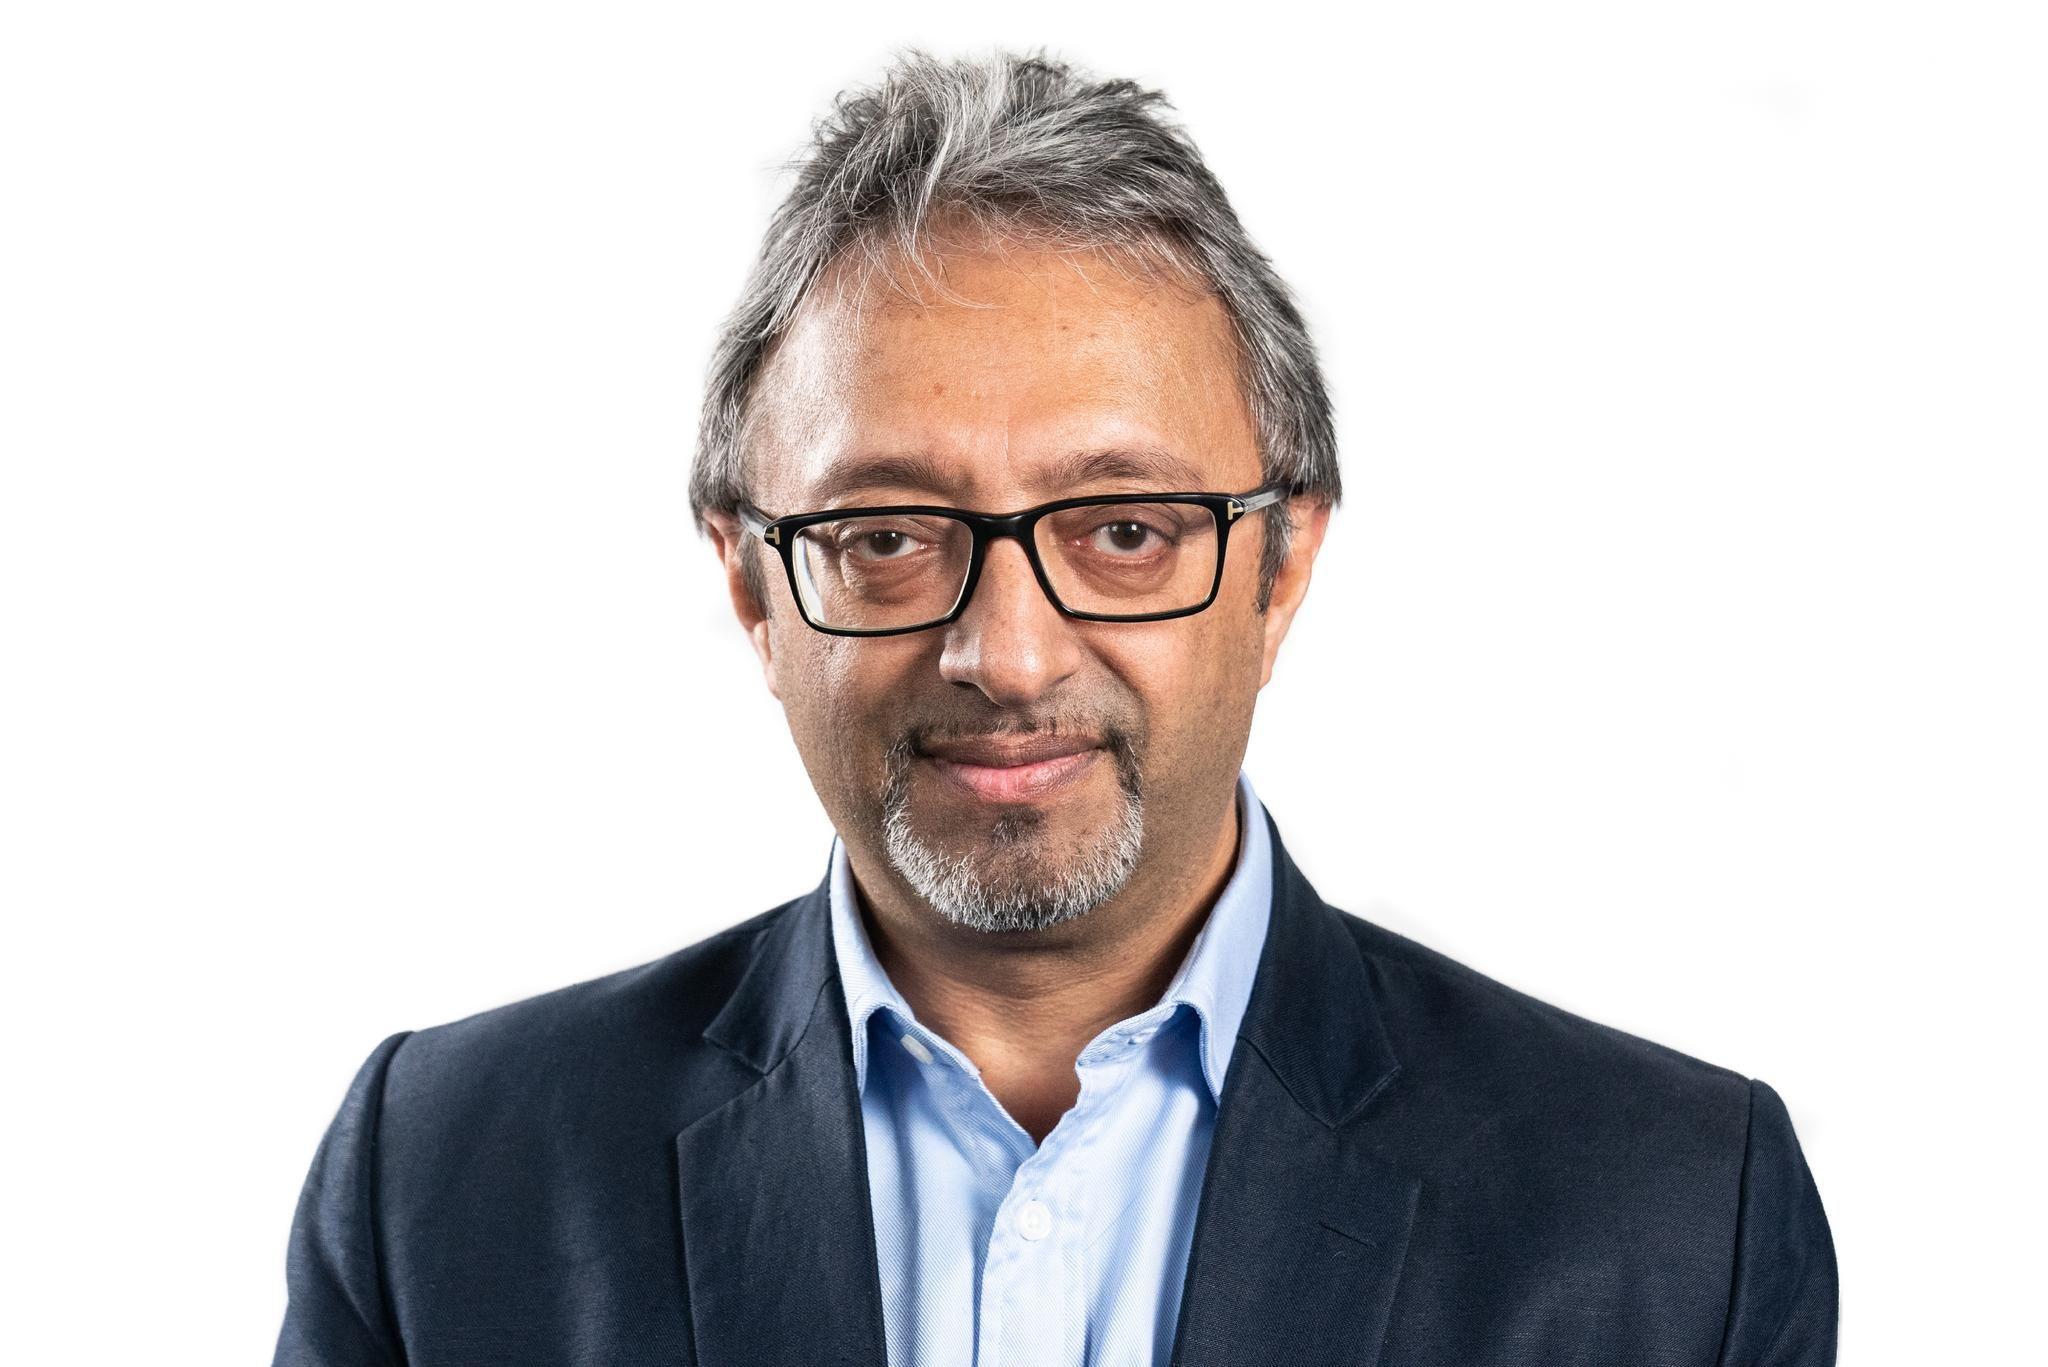 Harj Dhaliwal